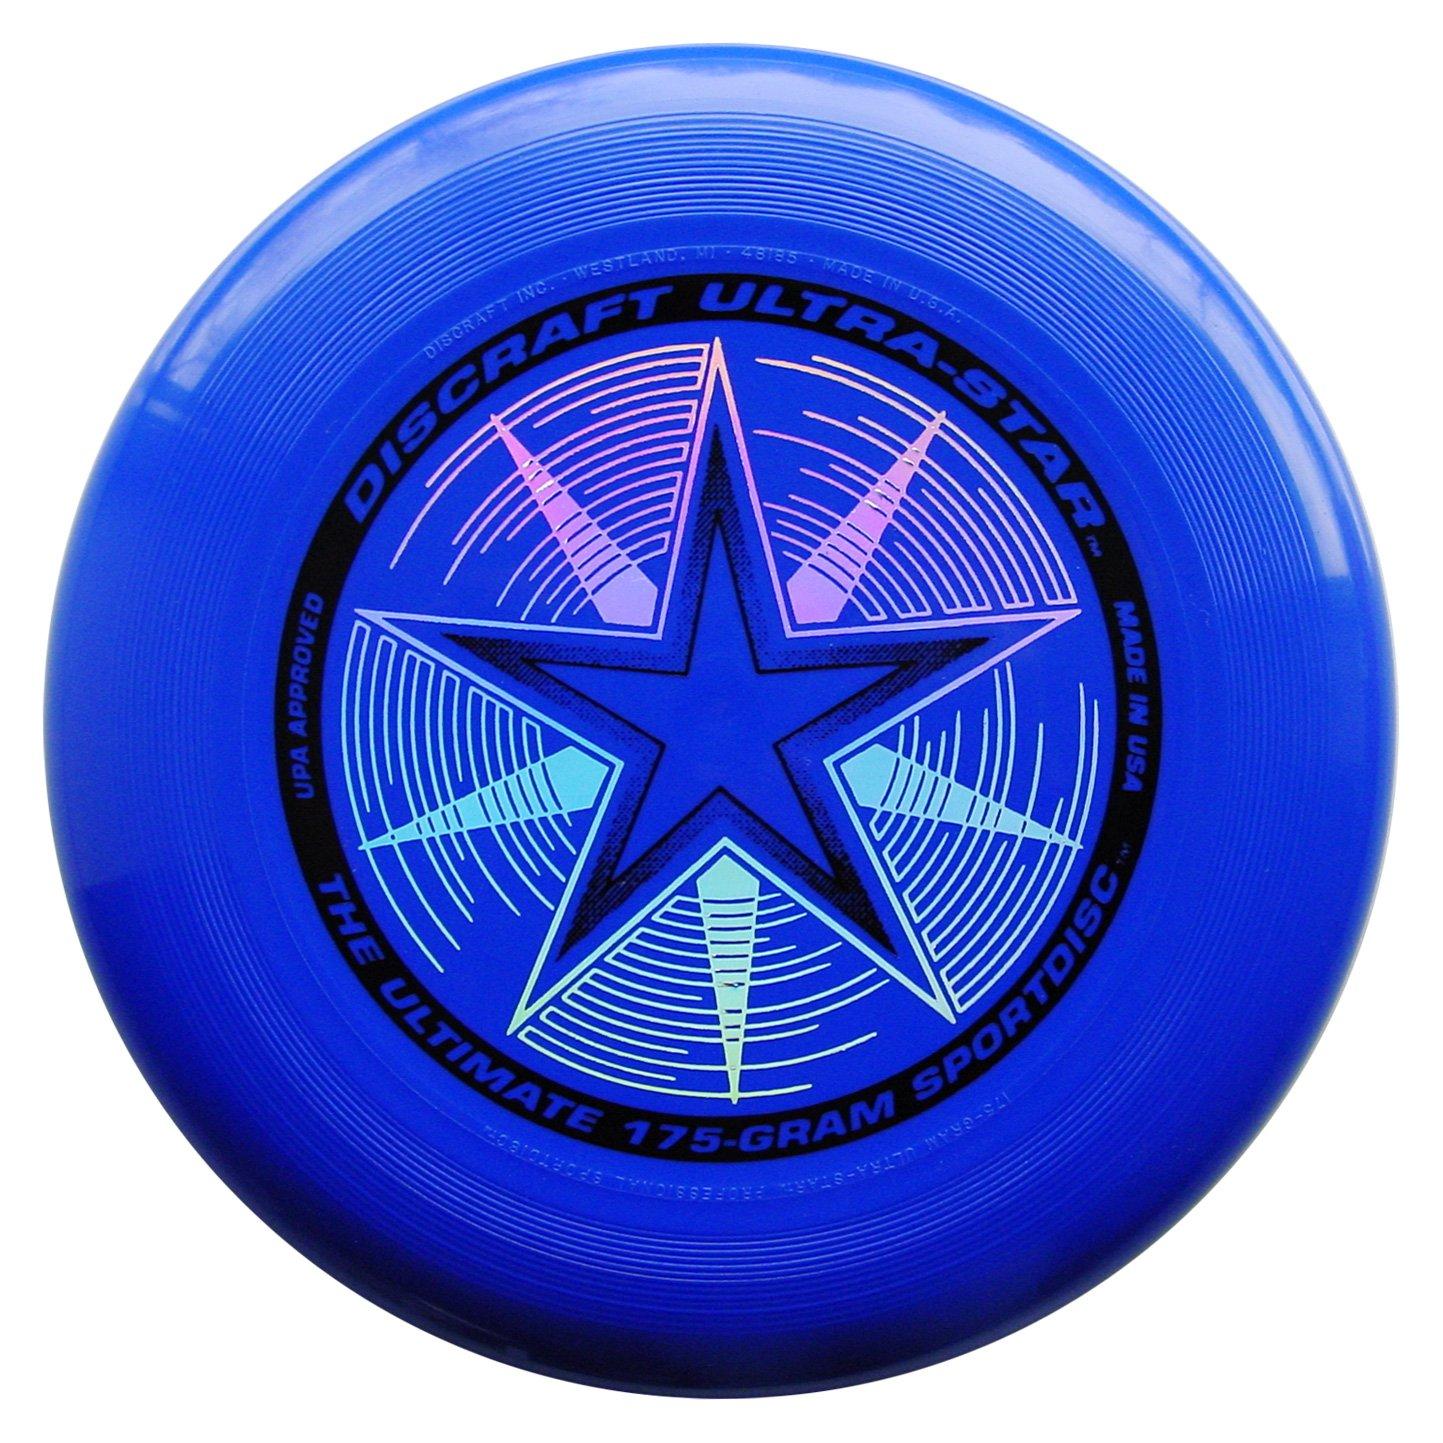 Frisbee Profesional Discraft 175 gr./27cm Azul Royal Deluxe